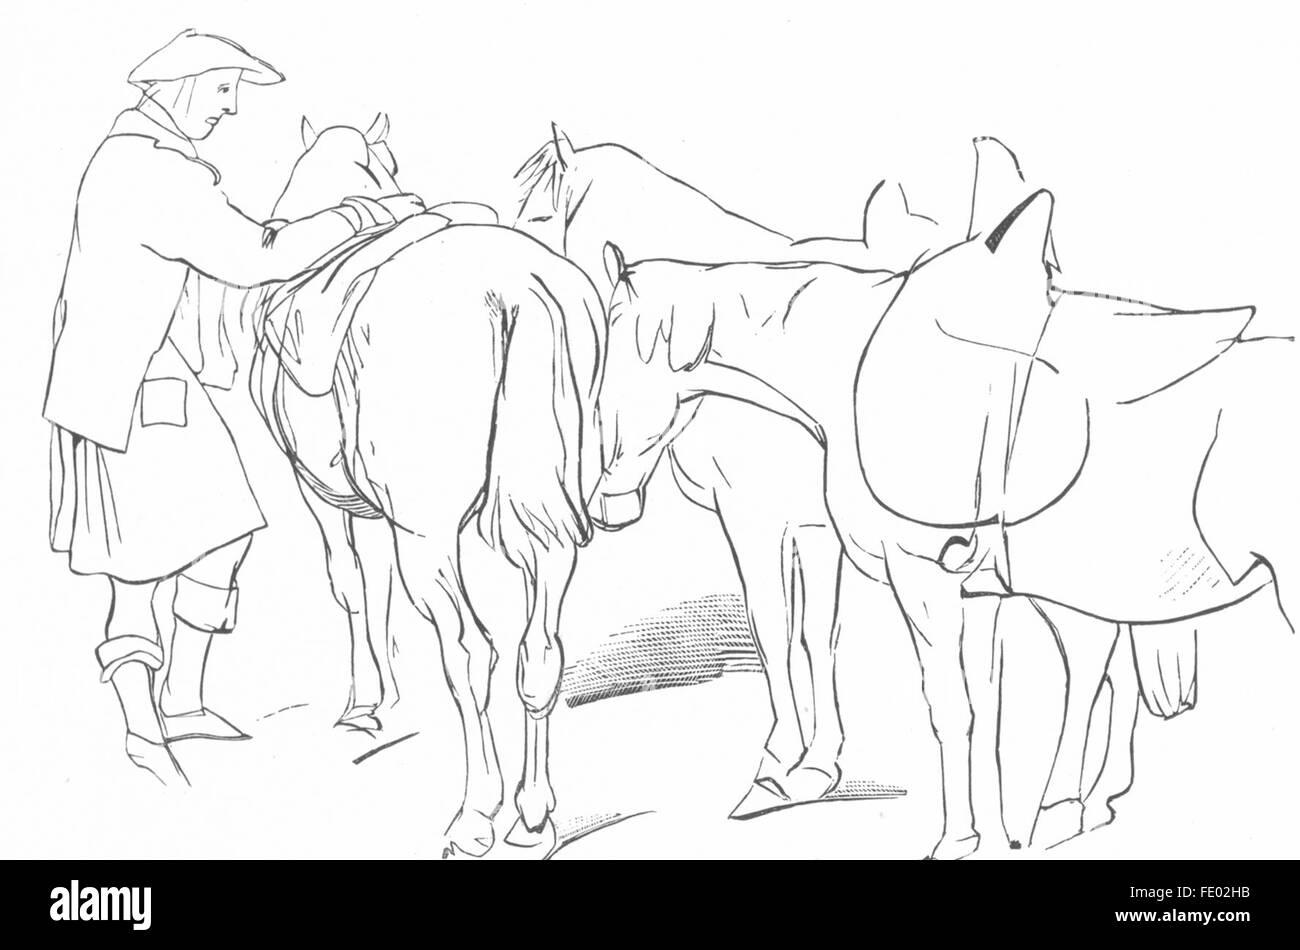 HORSES: Highlander & Ponies-Landseer, antique print c1880 - Stock Image